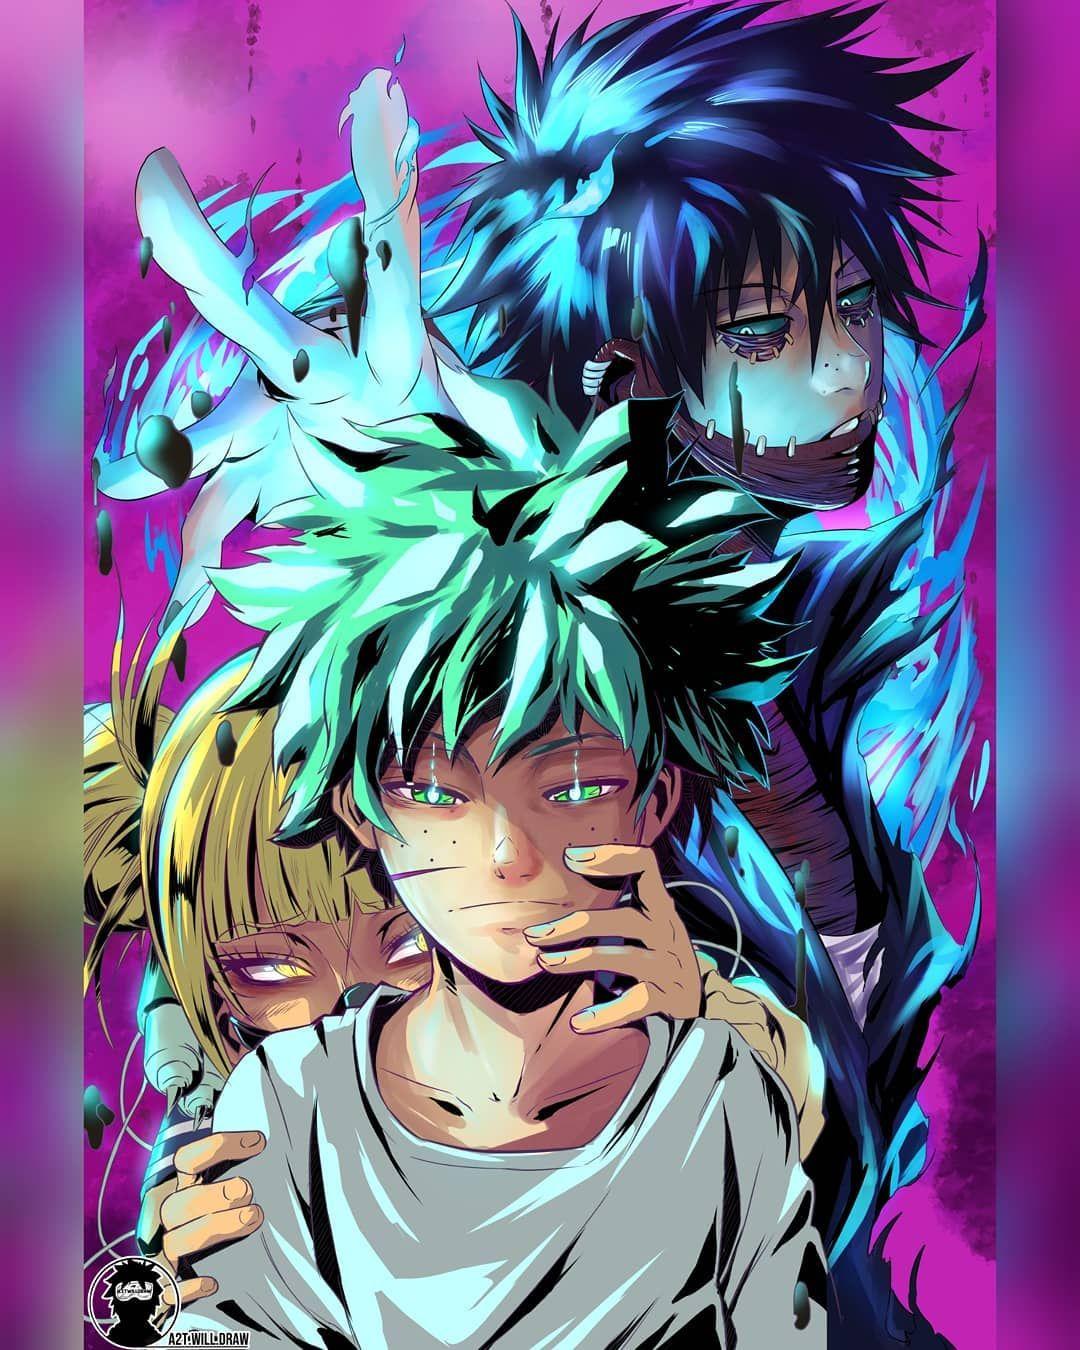 Pin By Iasfroes On Villain Deku Anime Evil Anime Villain Deku